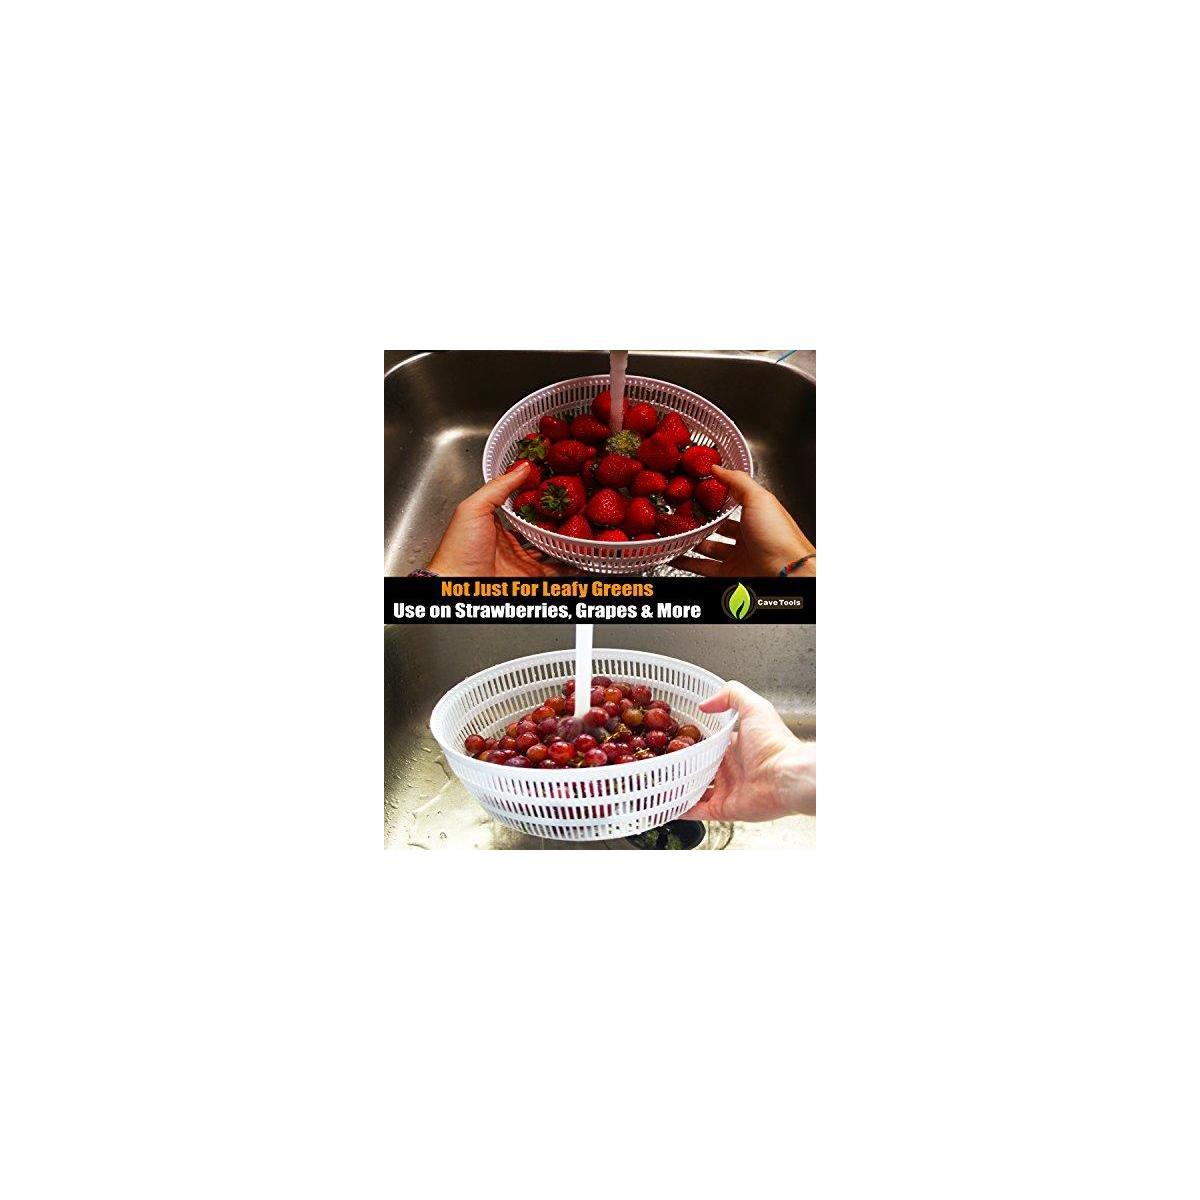 BBQ Skewers (10) Extra Long + Salad Spinner Large 4.2 Quarts Serving Bowl Set - QUICK DRY DESIGN & DISHWASHER SAFE - BPA Free Plastic - No Pump Pull String Needed, Turn Knob Drys Vegetables Fast